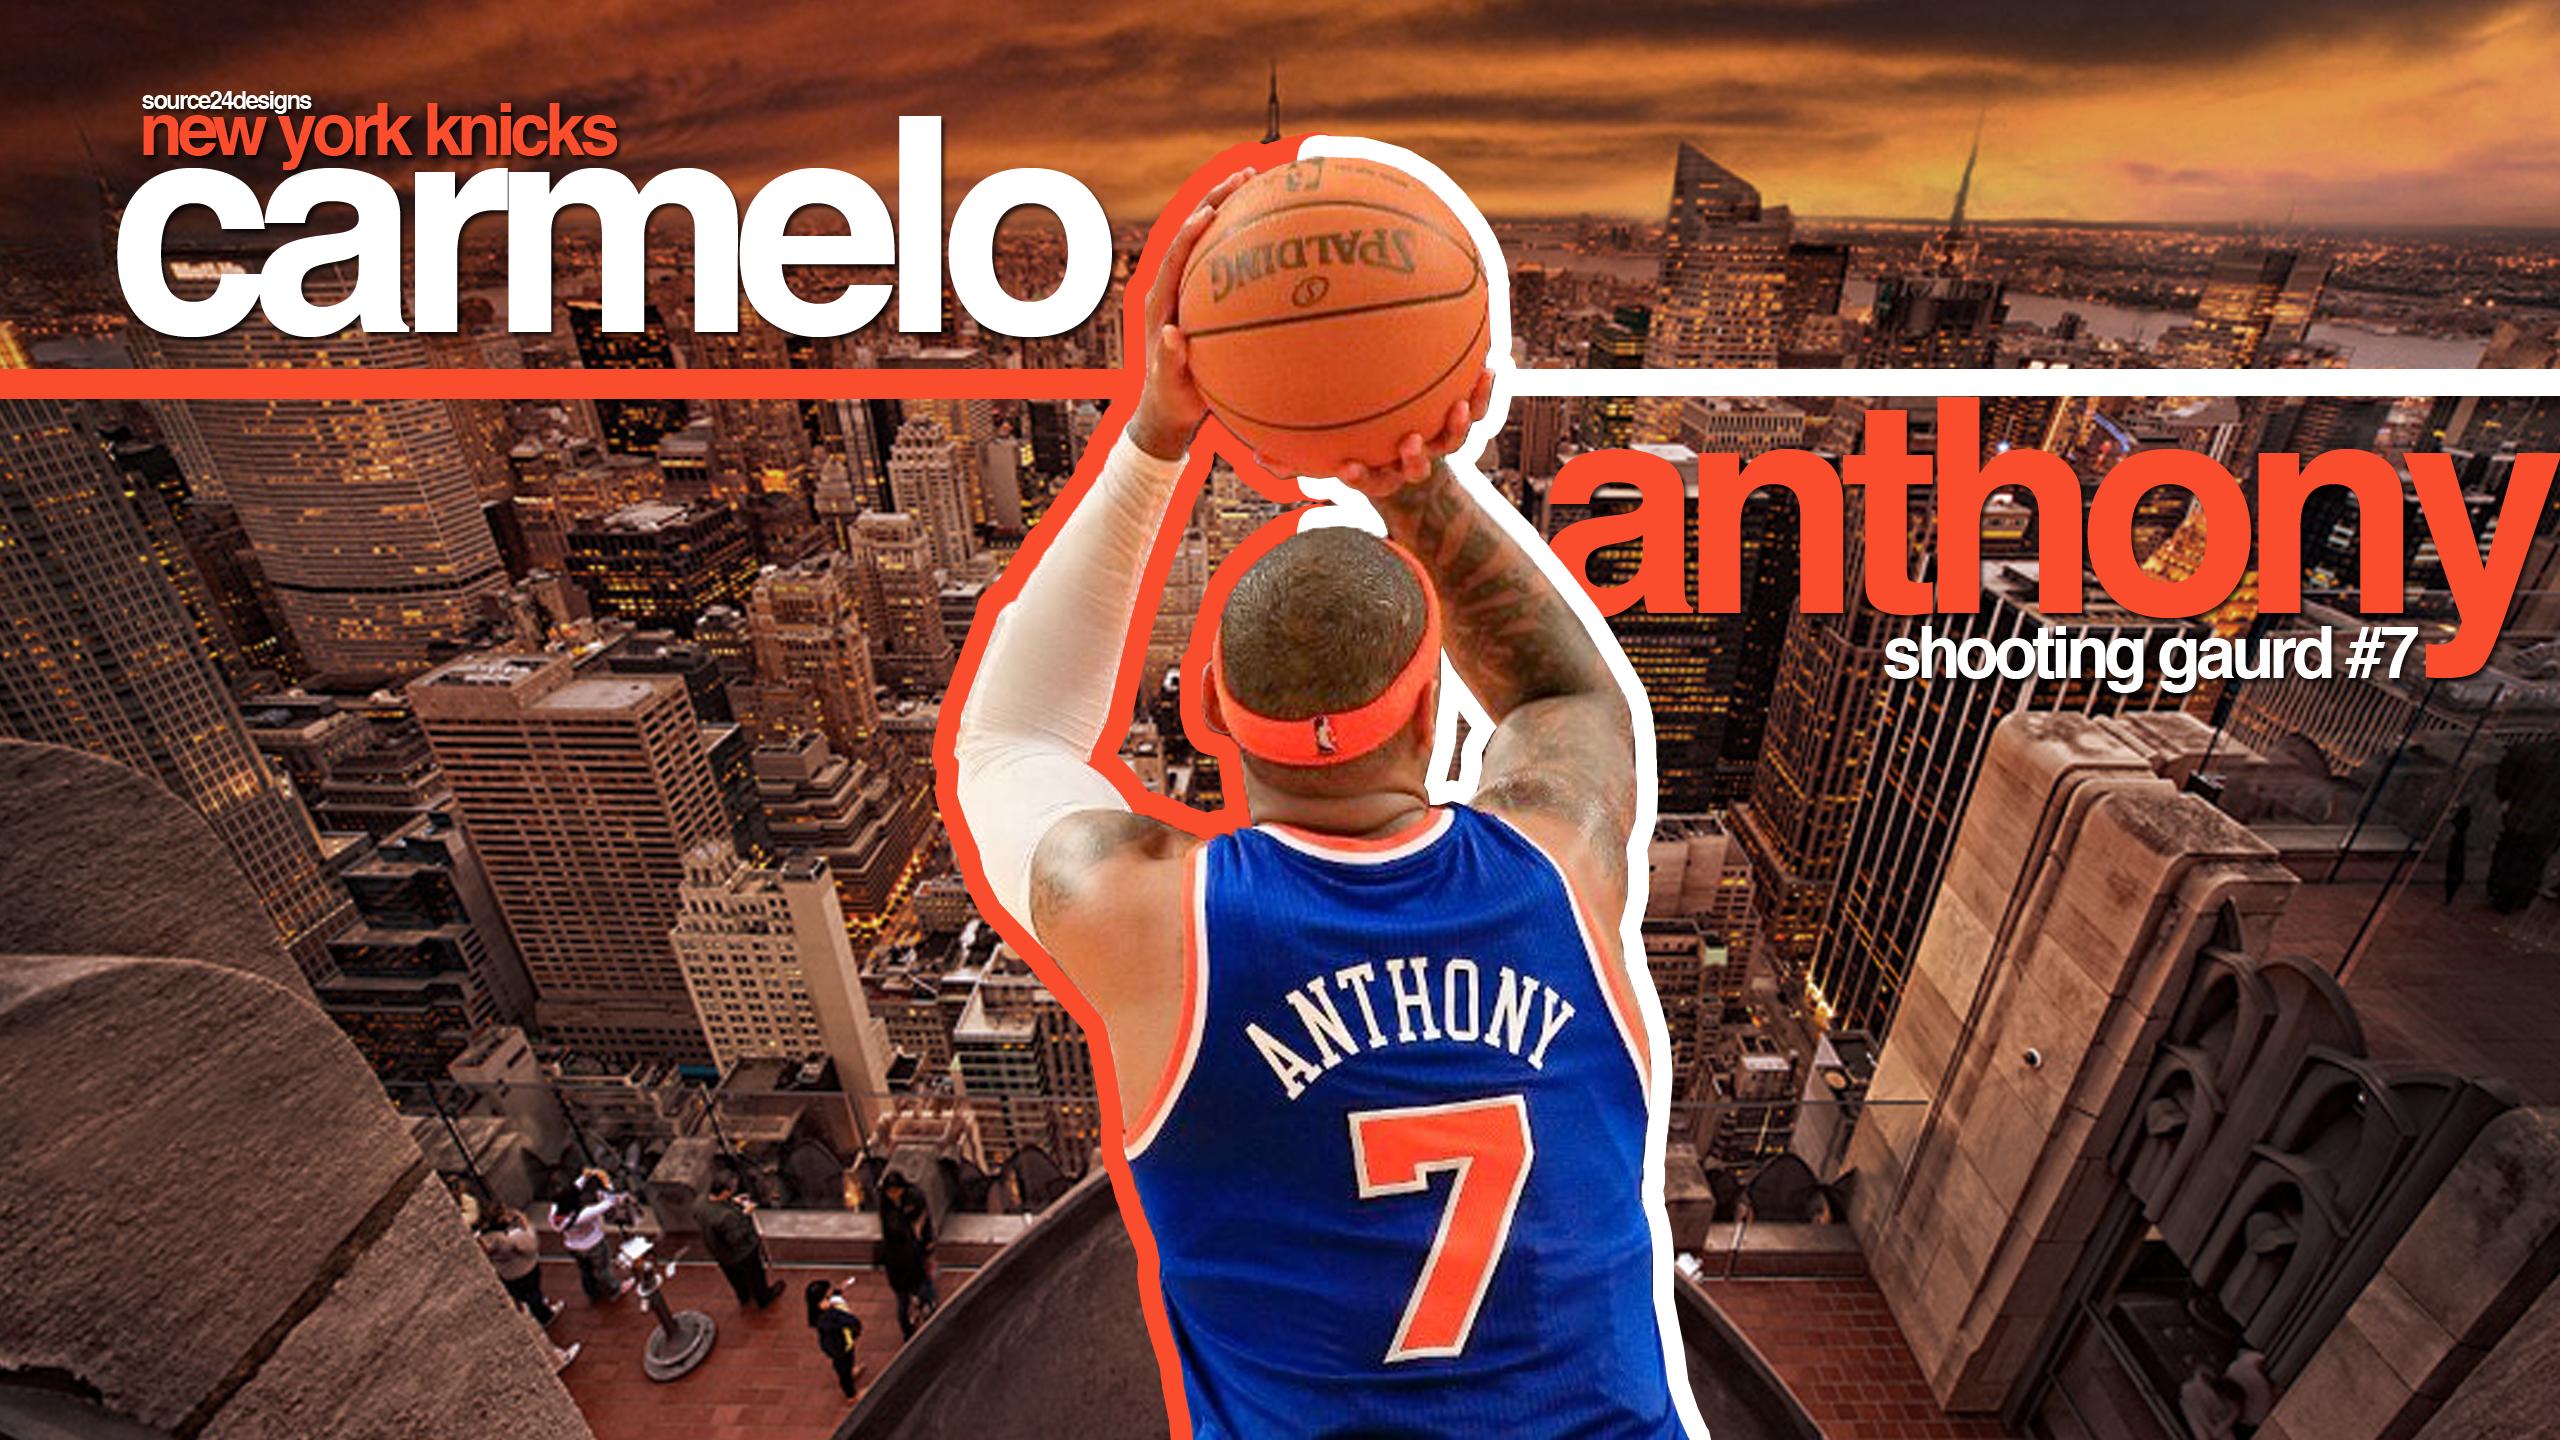 Knicks hd wallpaper wallpapersafari download carmelo anthony knicks hd wallpaper 2700 full size voltagebd Images